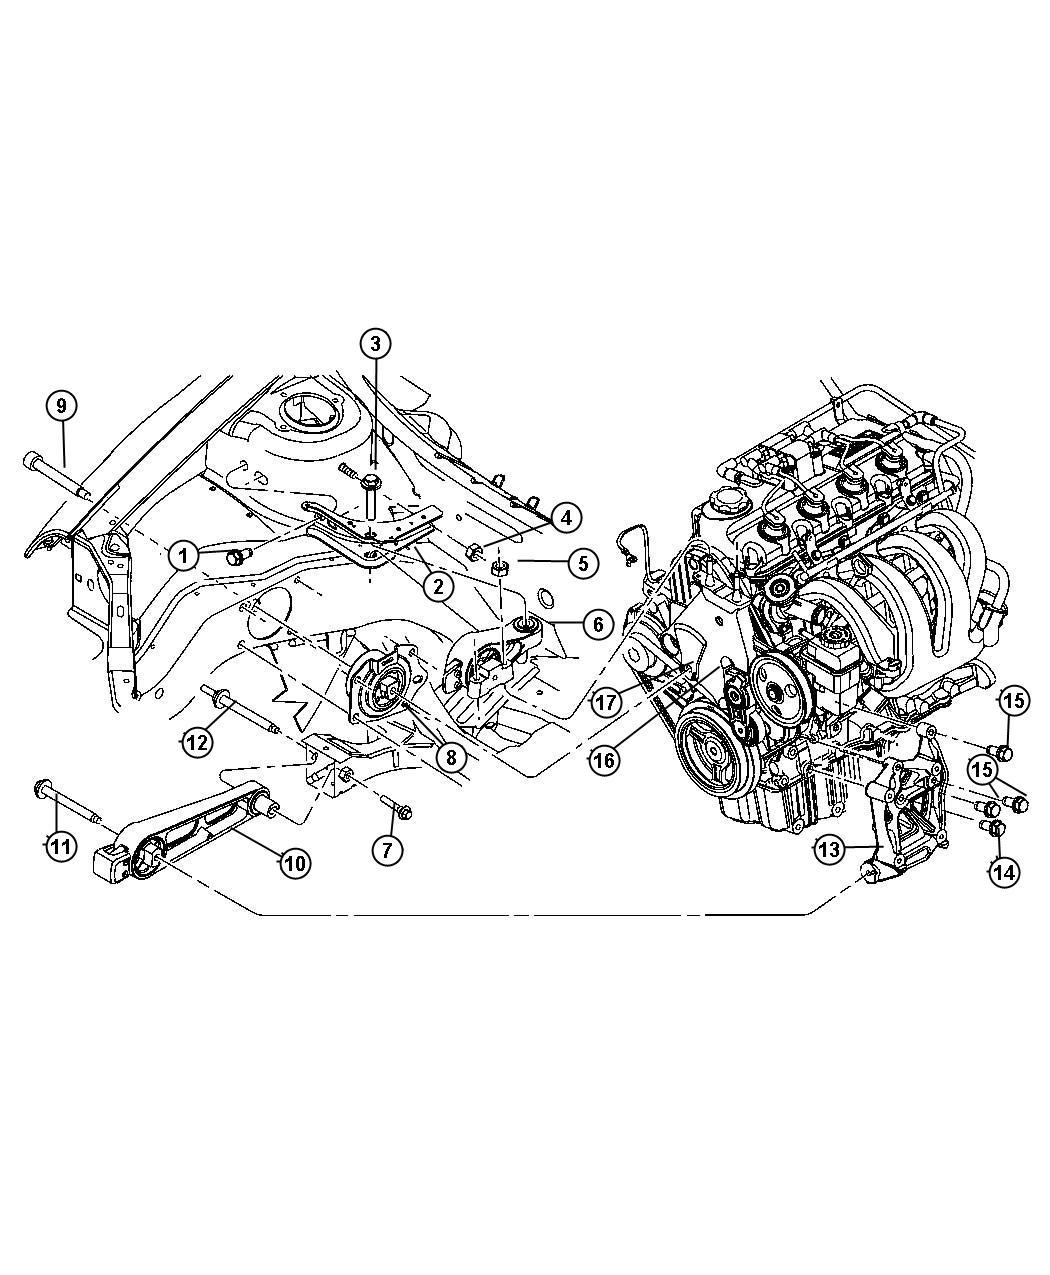 Dodge Neon Isolator, strut. Engine mount, torque reaction